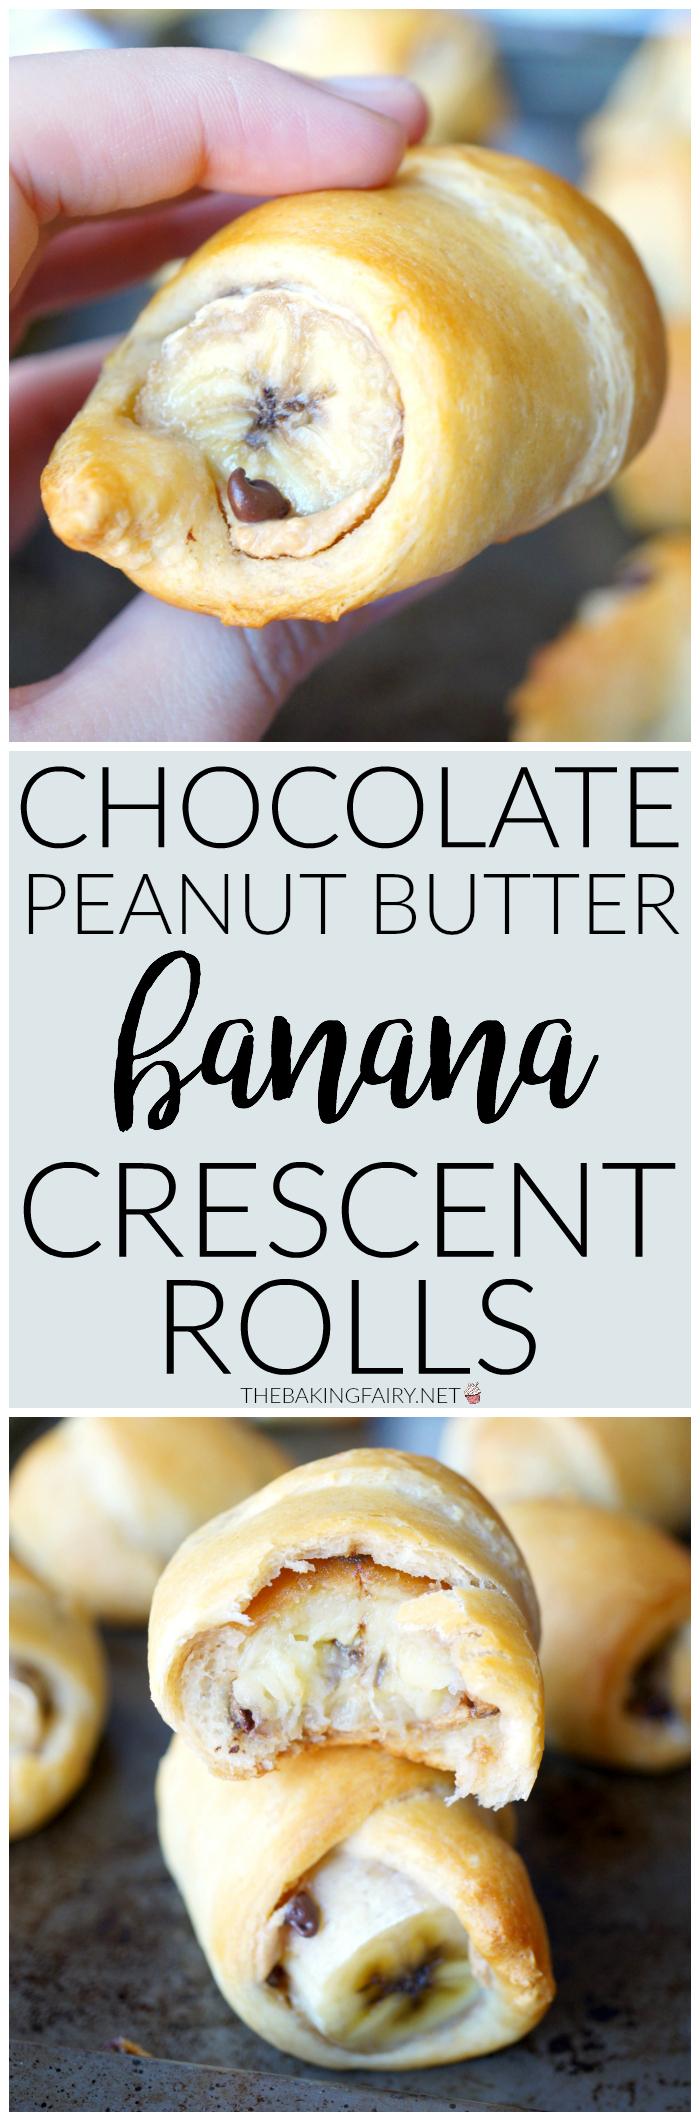 chocolate peanut butter banana crescents | The Baking Fairy